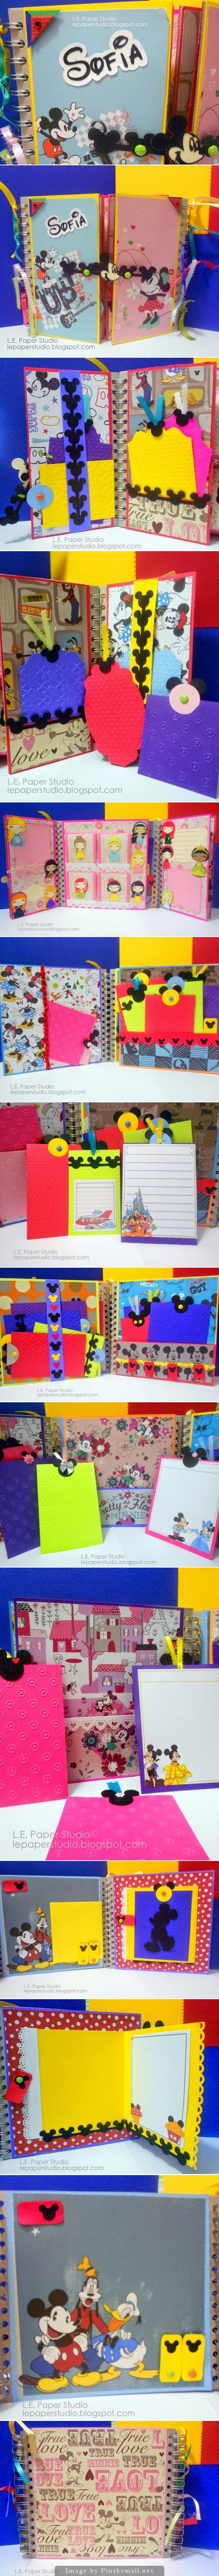 Disney scrapbook ideas - Disney